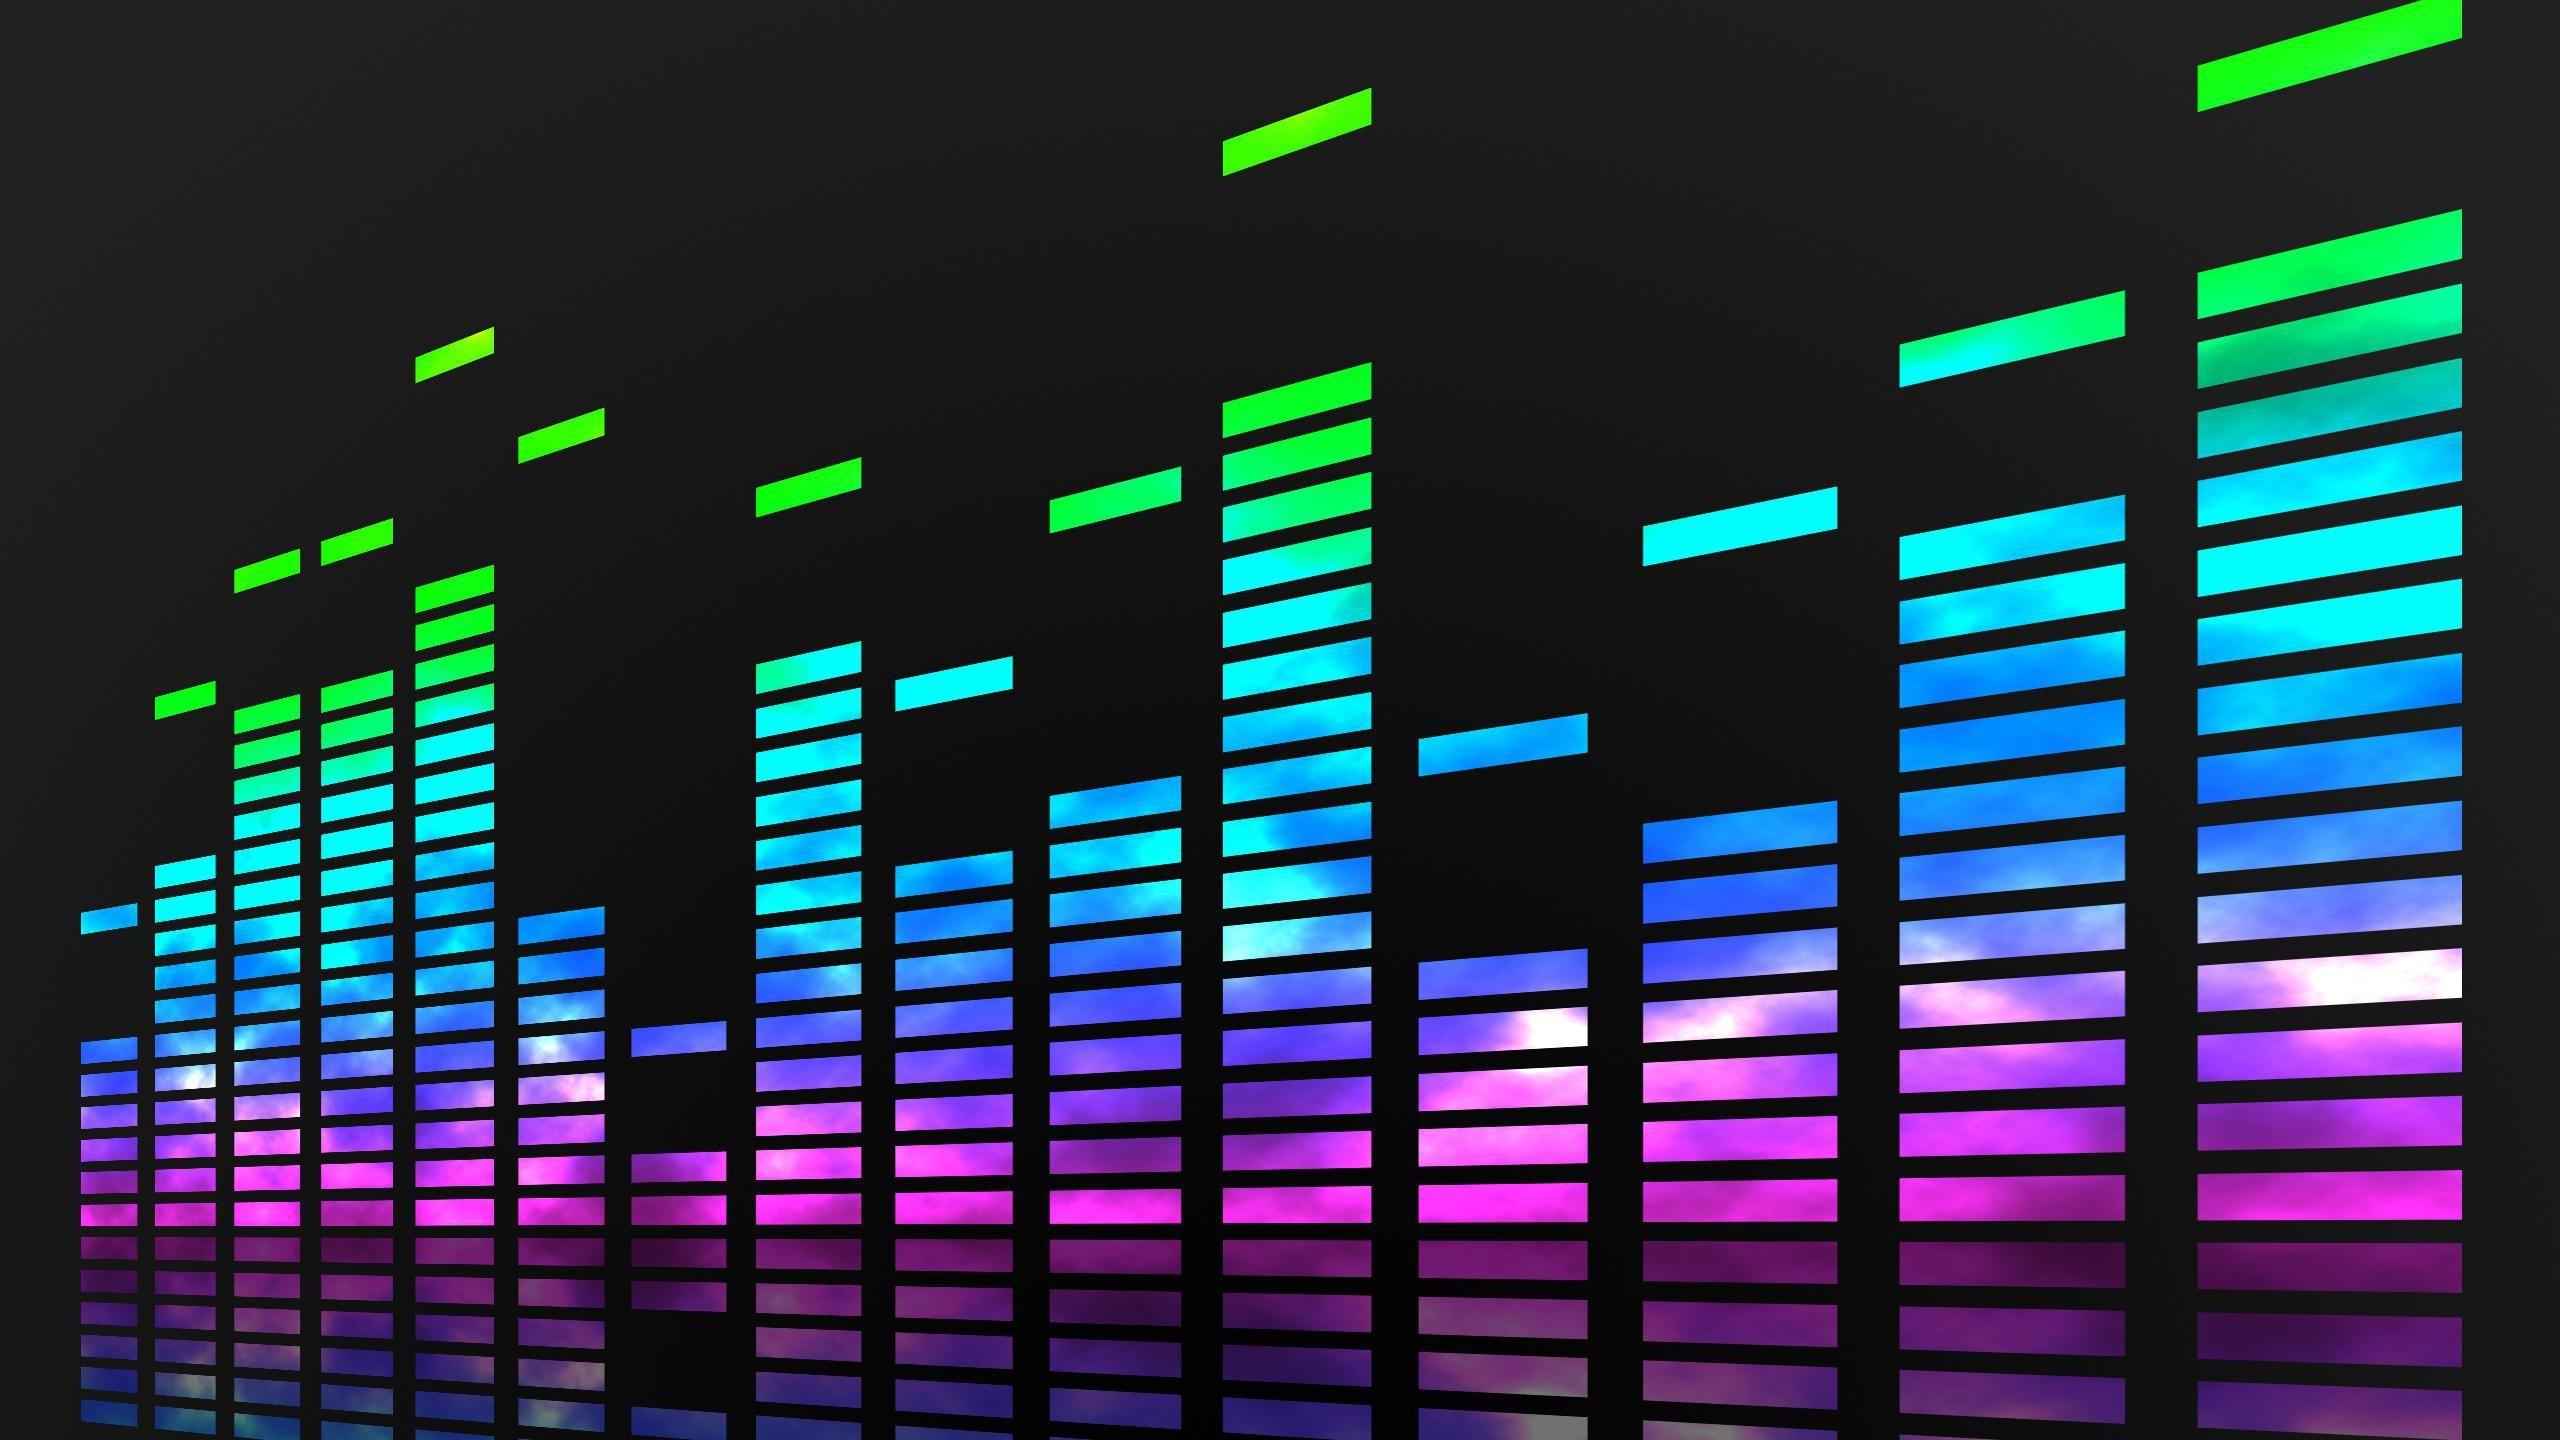 Music Wallpaper For Ipad: Music Wallpaper ·① Download Free Stunning High Resolution